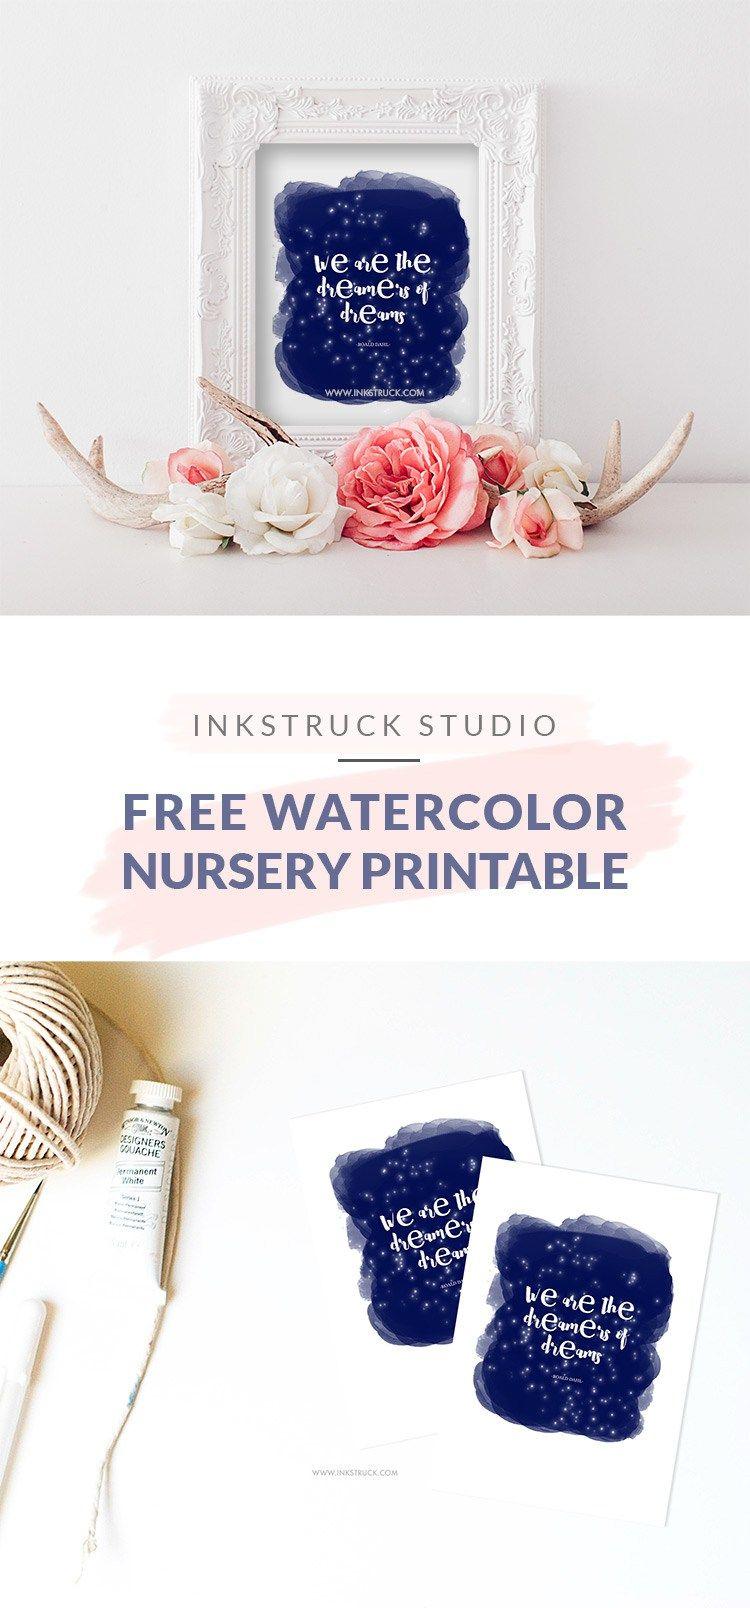 Free Watercolor Nursery Printable Watercolor Printable Designs